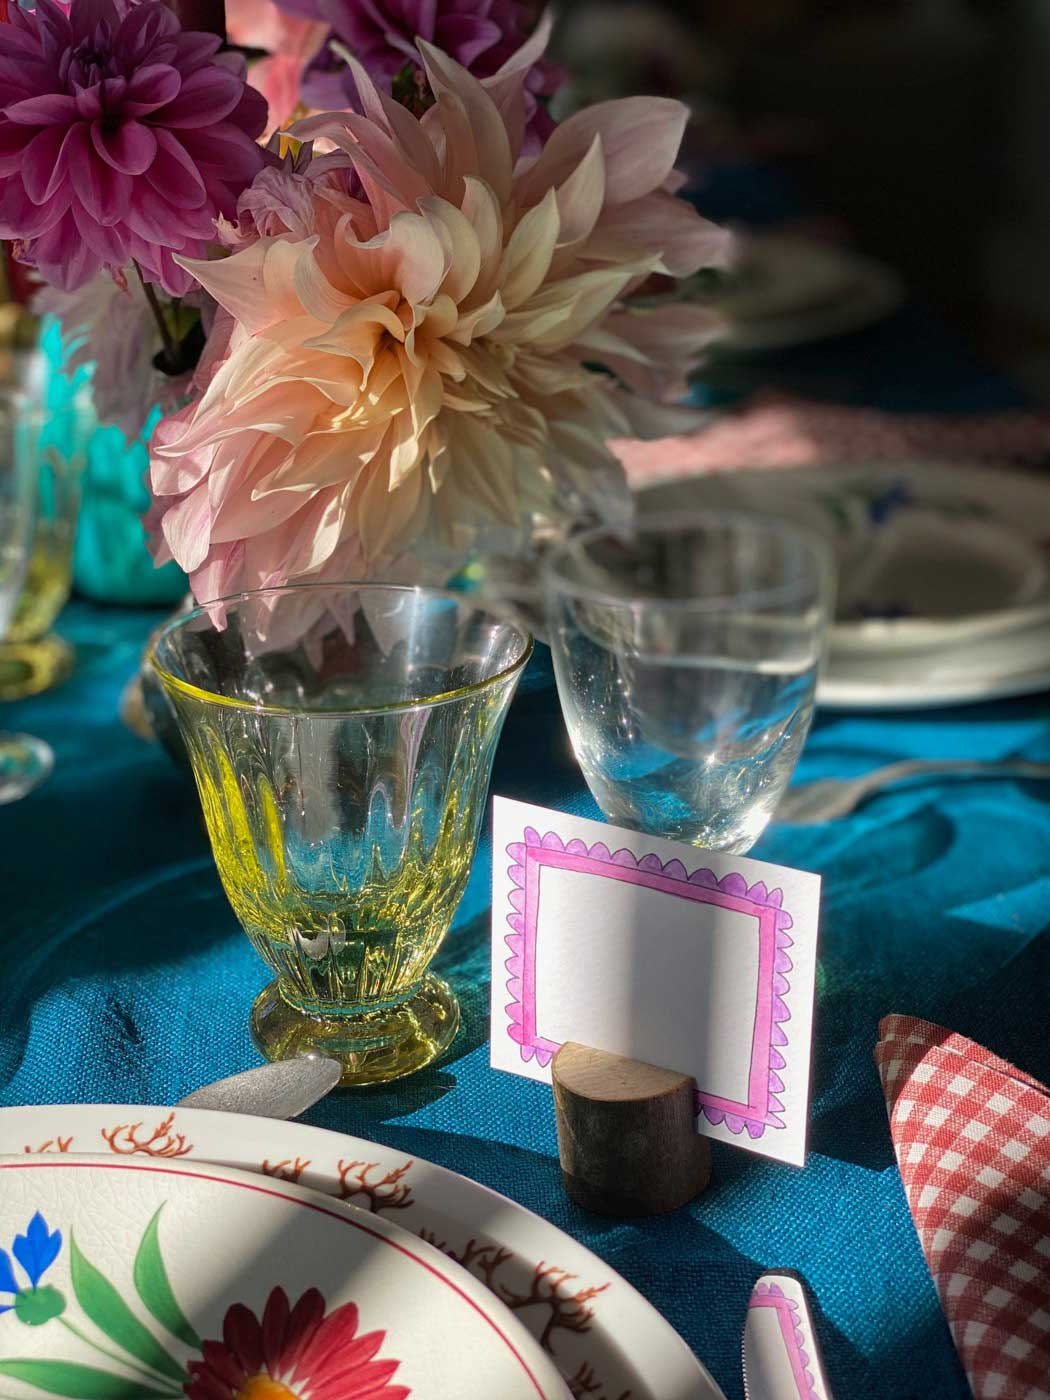 dresser-table-art-dahlias-tablescape-how-to-set-table-vt-09